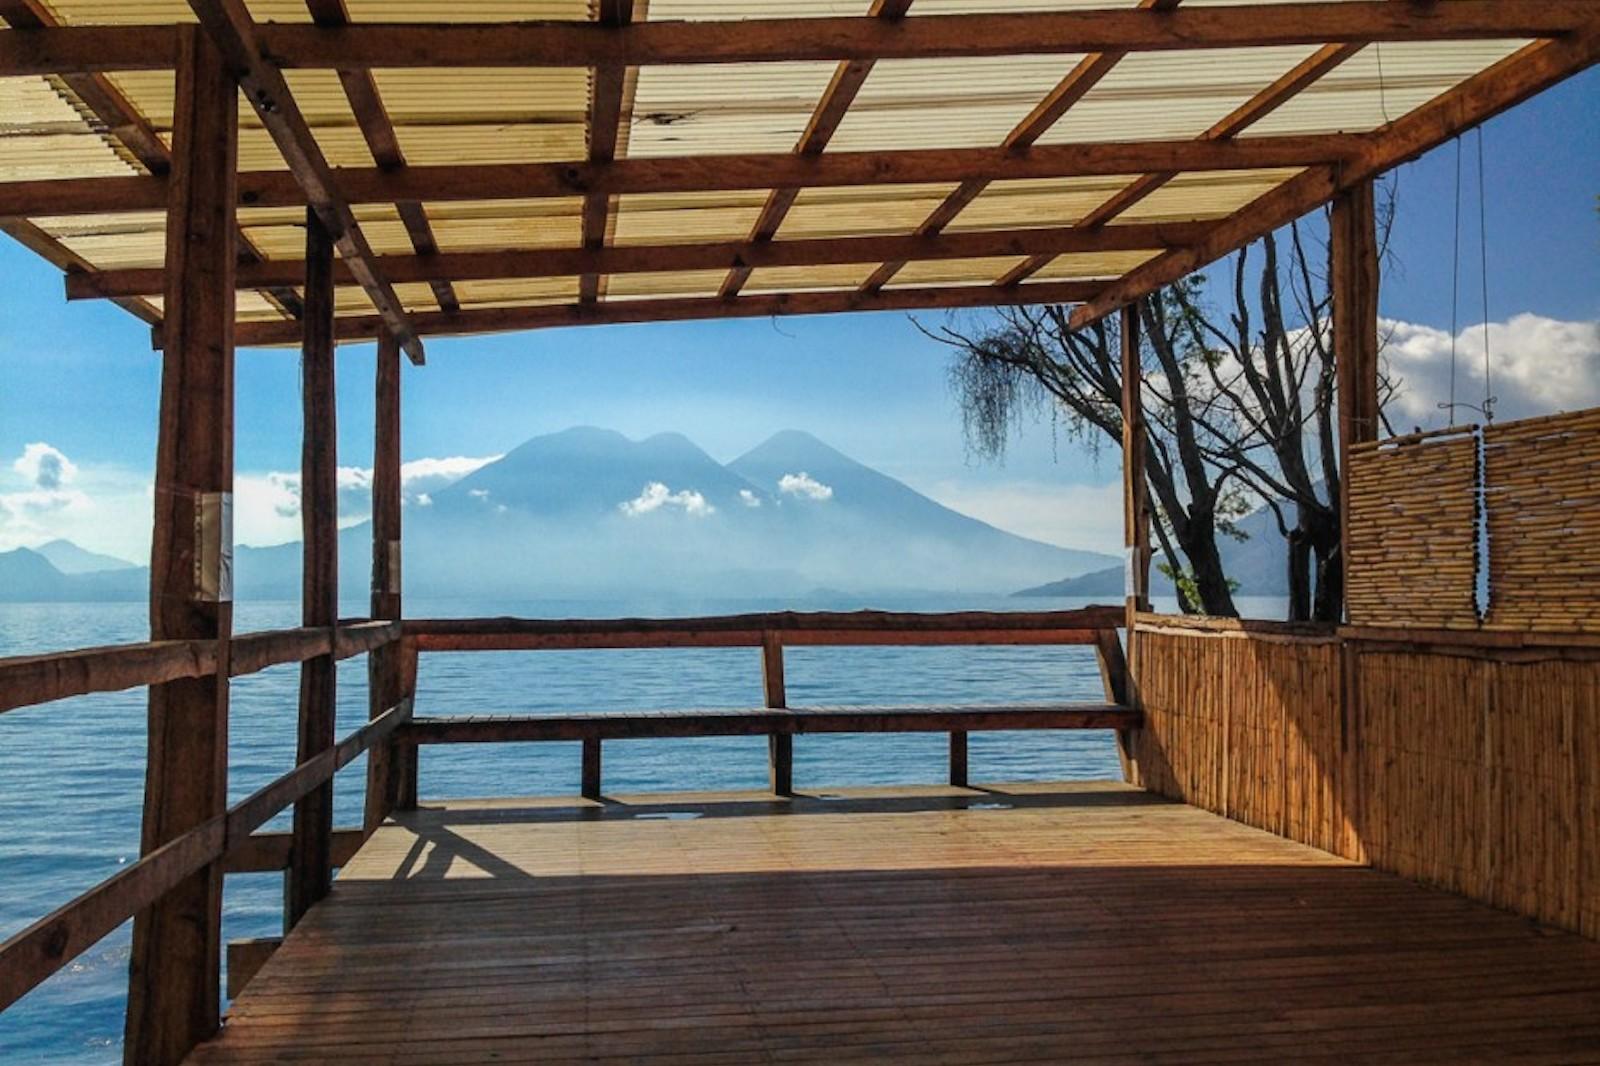 yoga deck at hostal del lago on lake atitlan